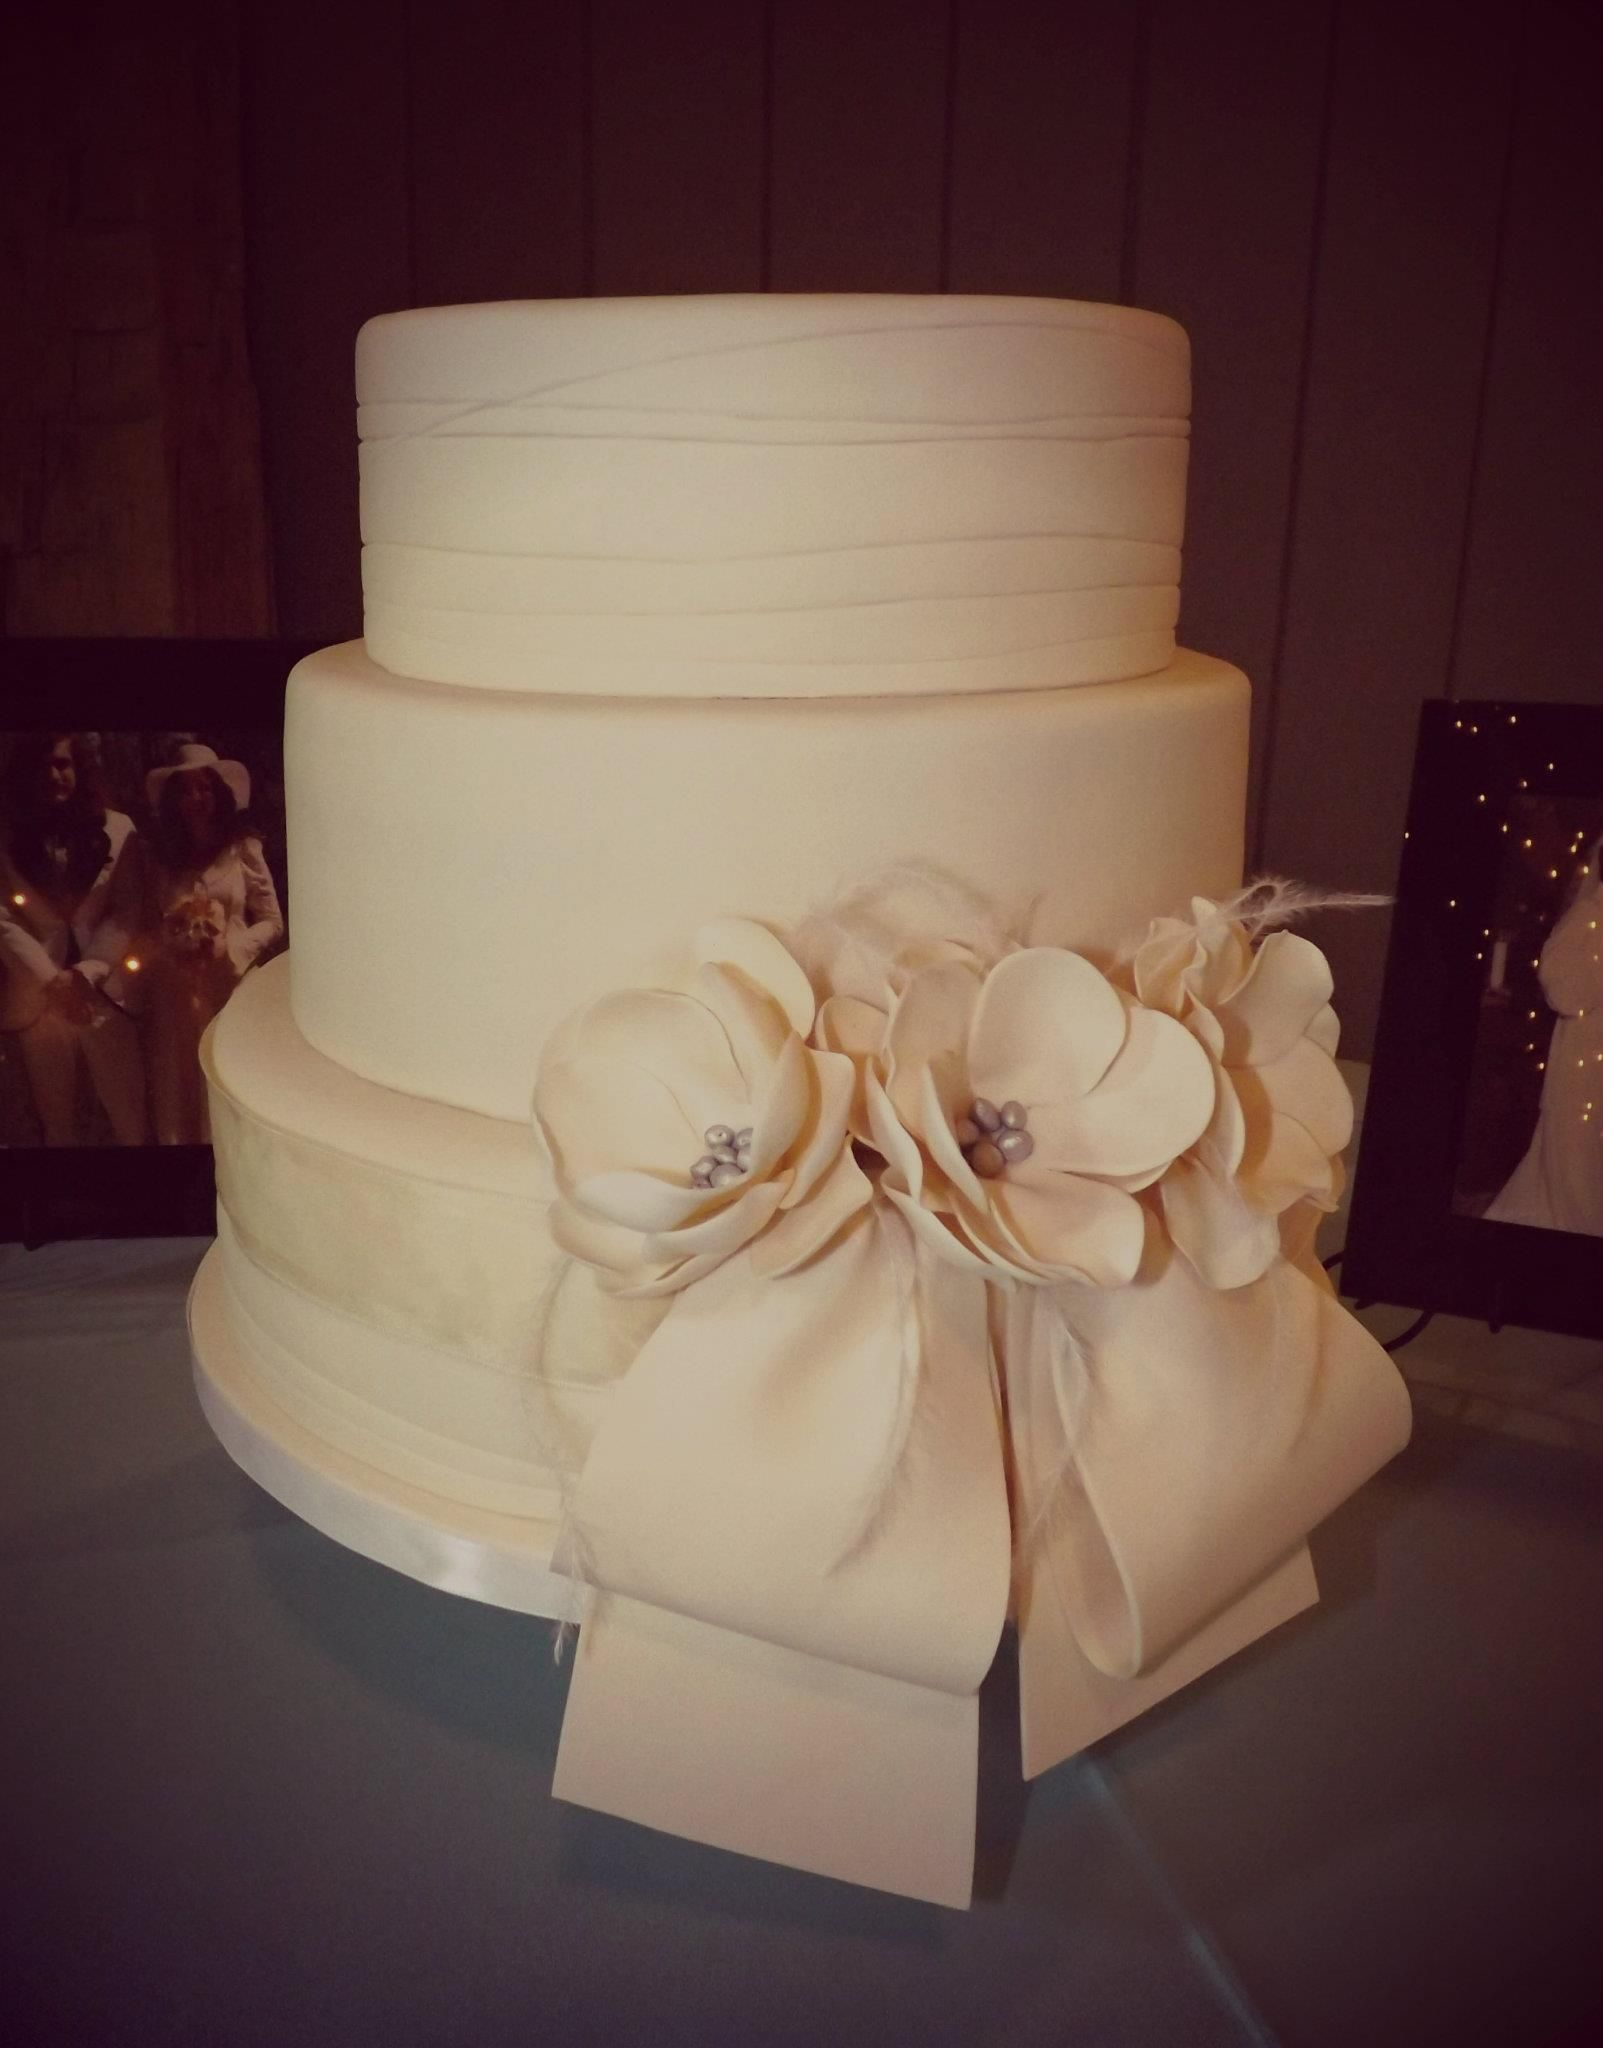 Textured Fondant Wedding Cake With Fondant Bow Wicked Wedding - Wicked Wedding Cakes